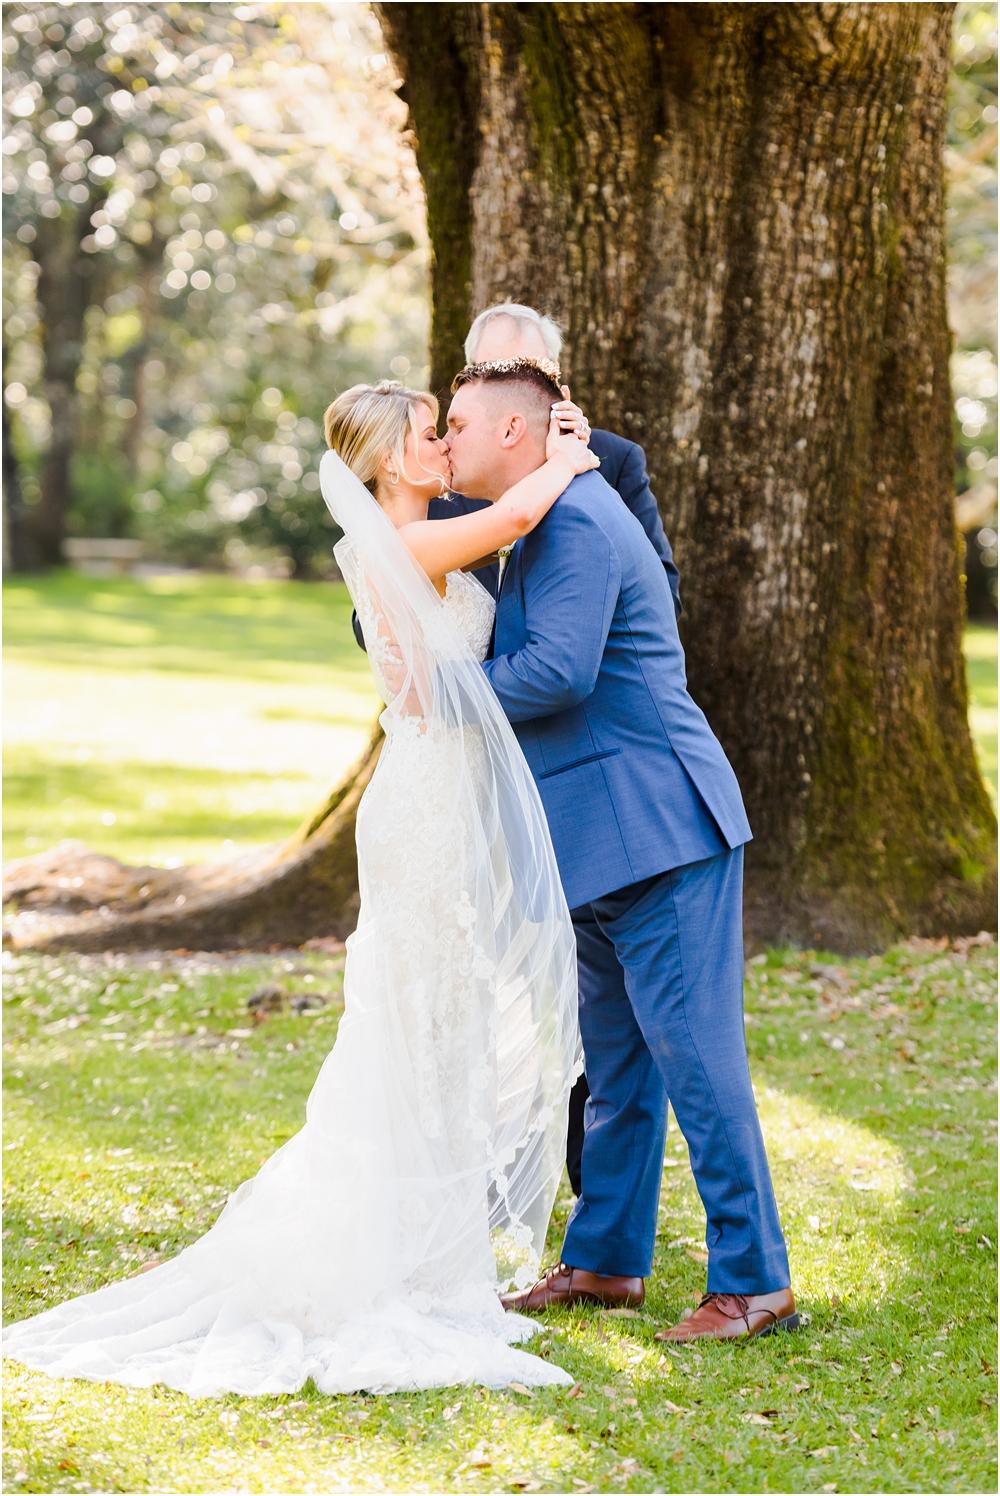 eden-gardens-walton-county-florida-wedding-kiersten-stevenson-photography-59.jpg